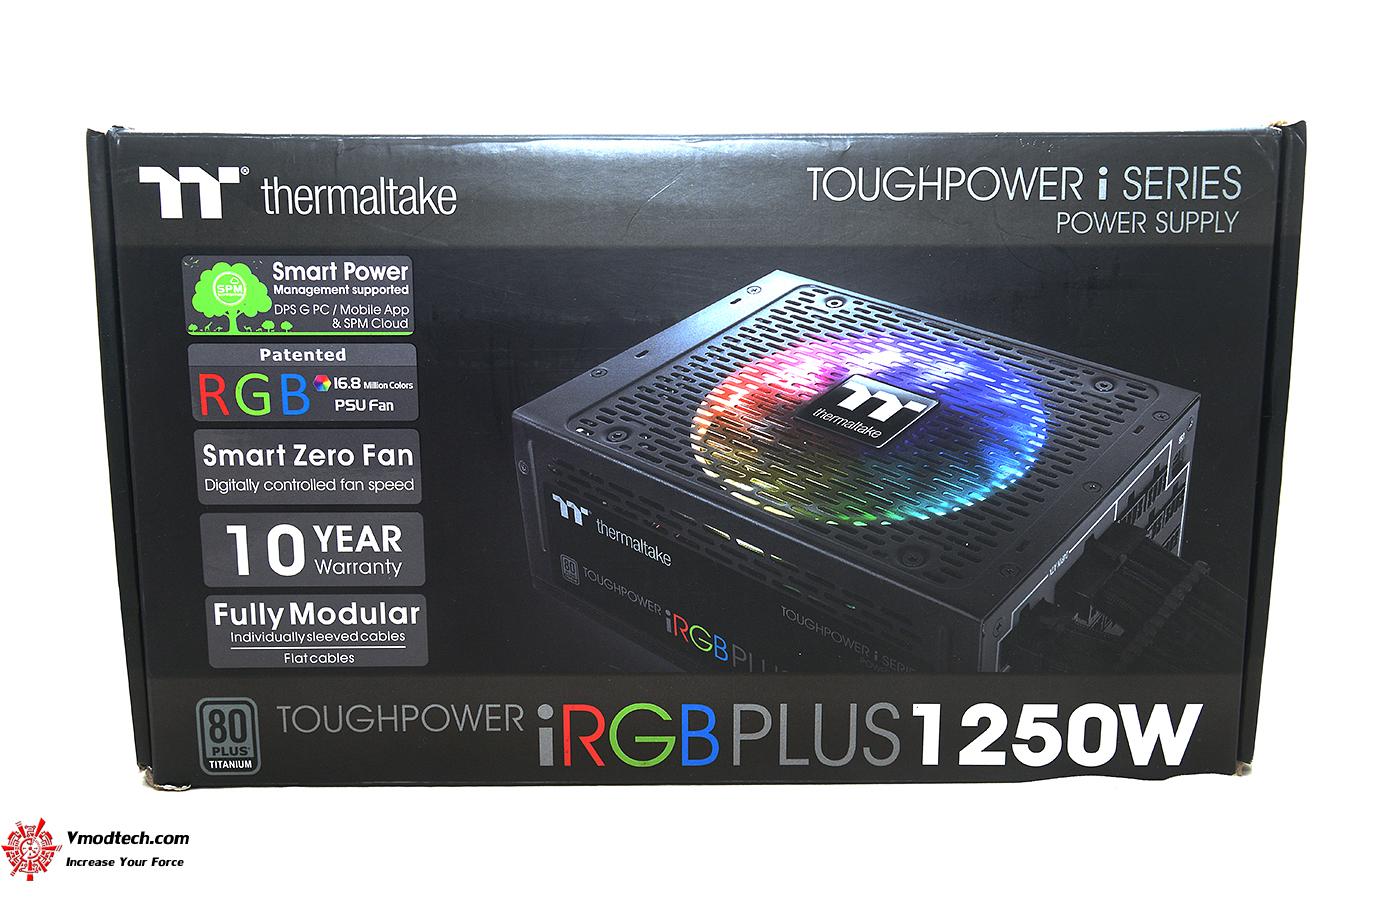 dsc 2571 Thermaltake Toughpower iRGB PLUS 1250W Titanium   TT Premium Edition Review